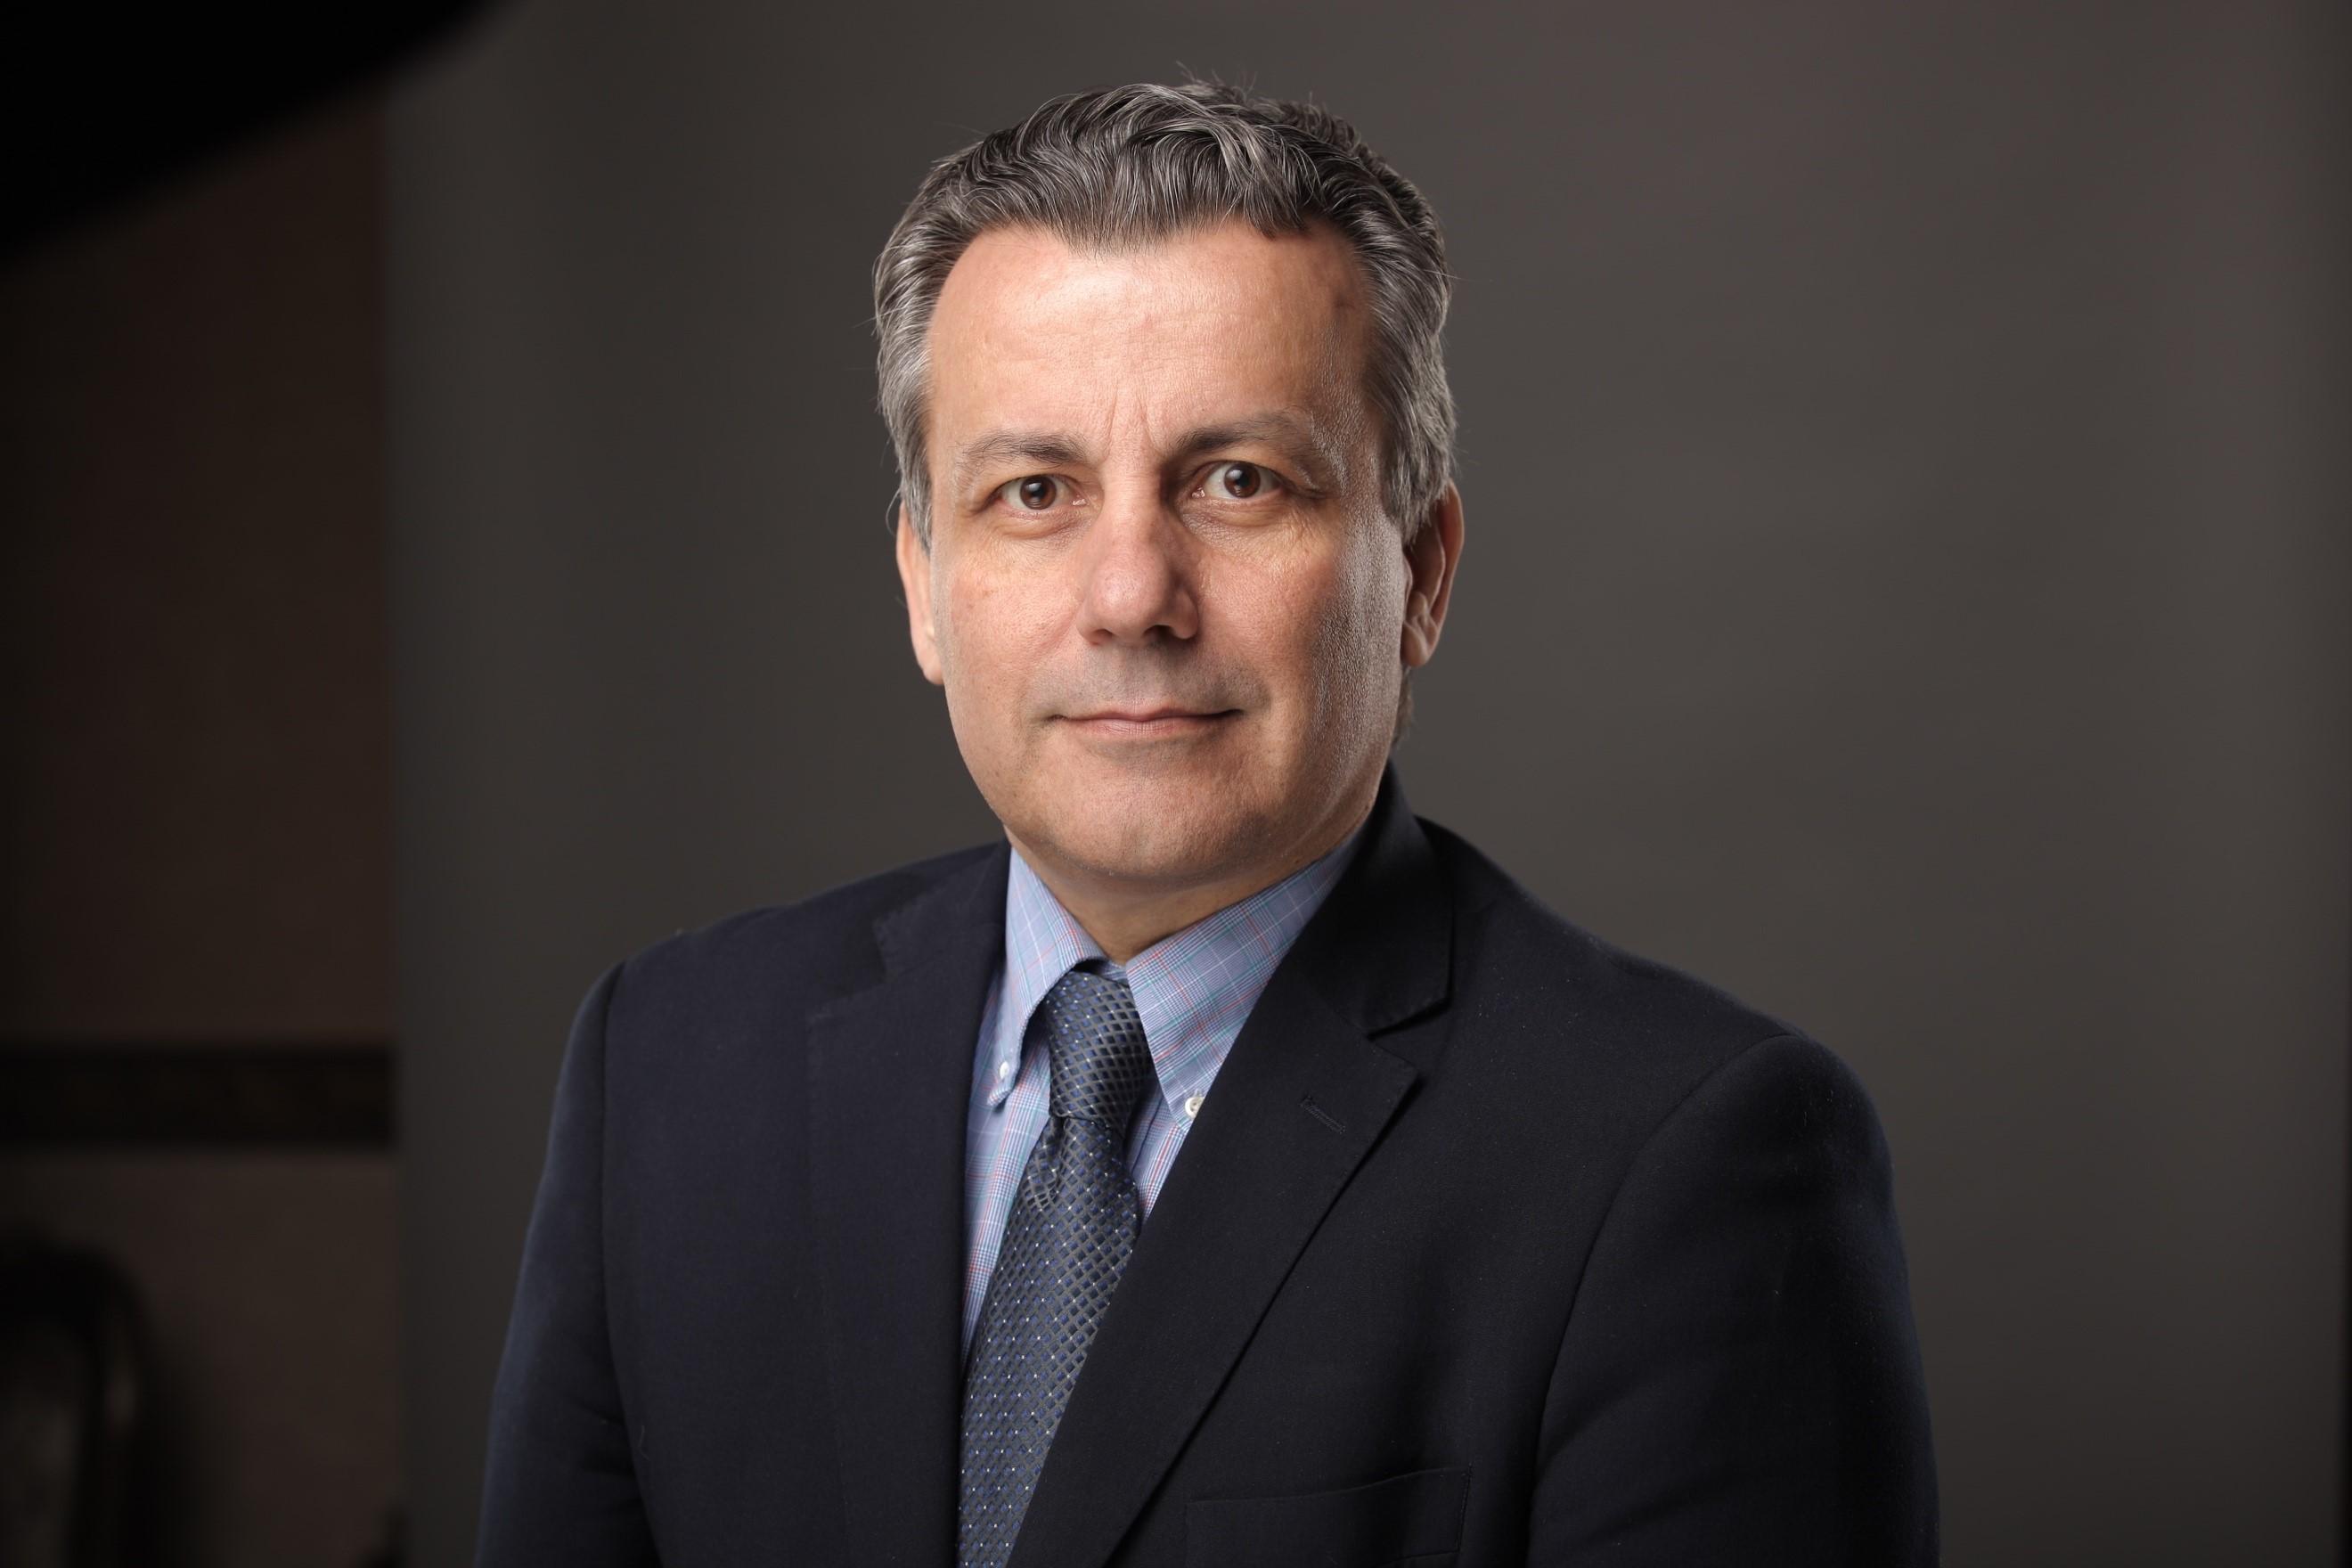 Ioannis Karamitsos